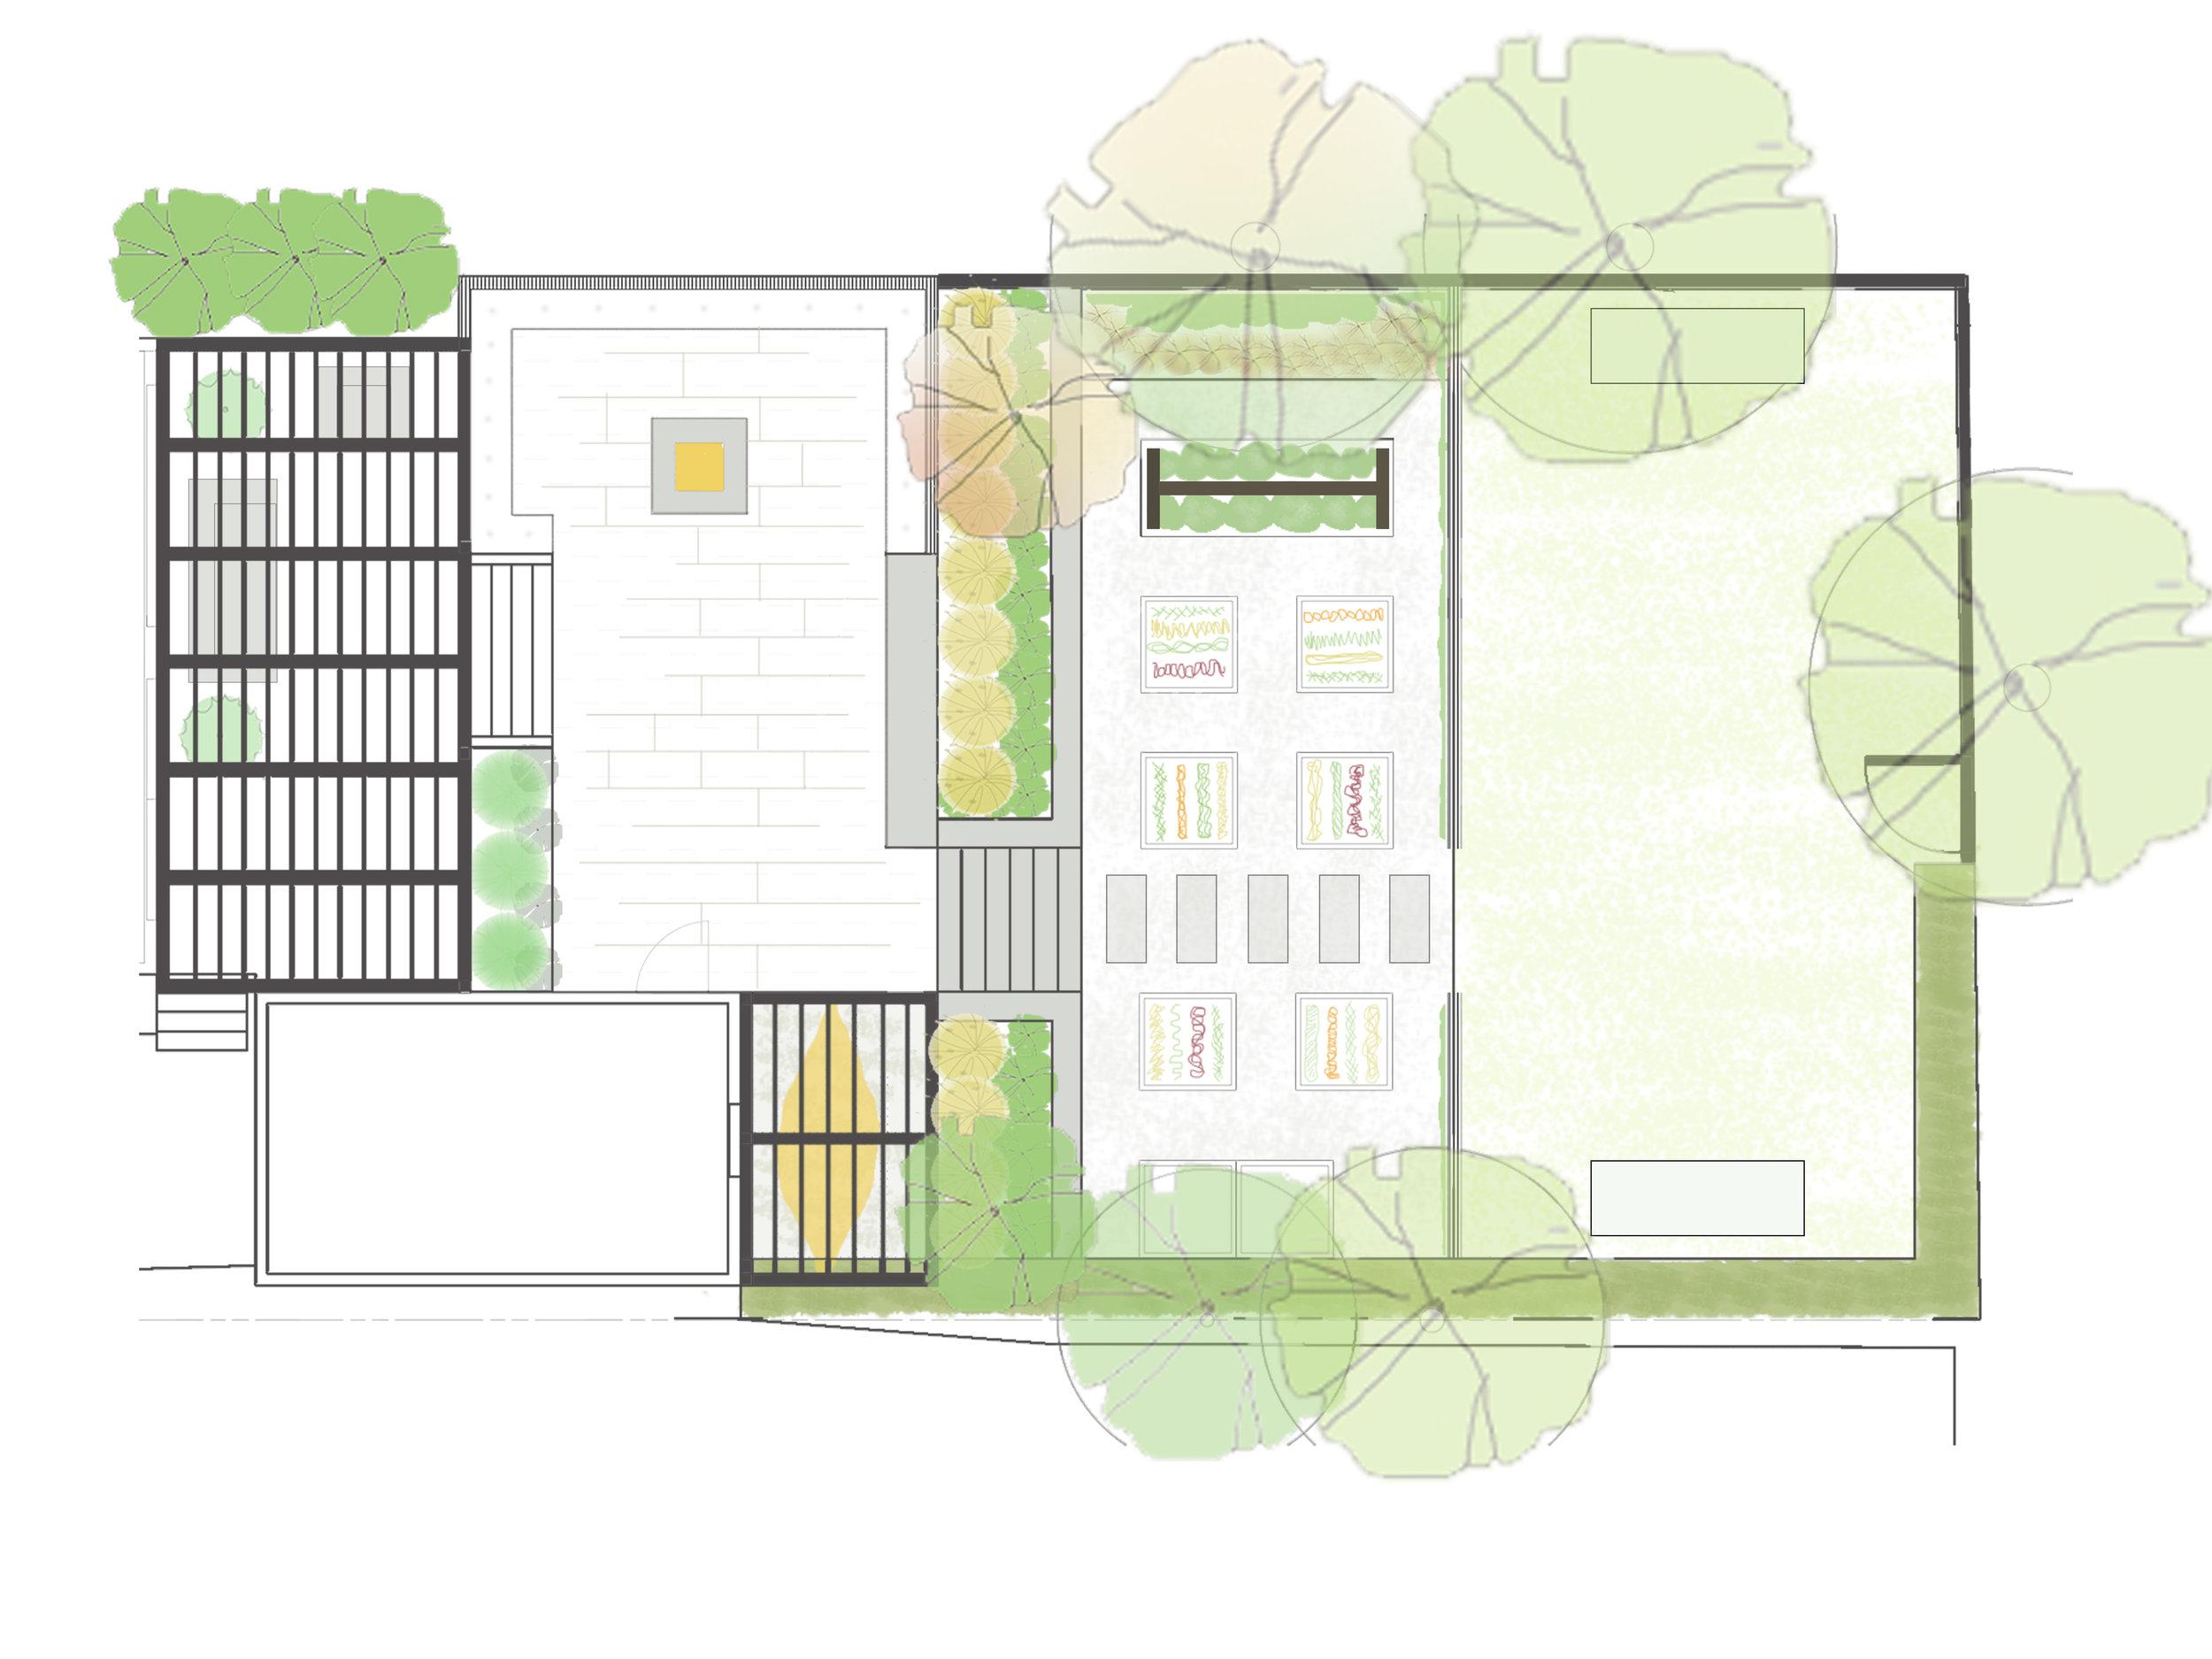 Halifax Landscape Architect - Land Studio East